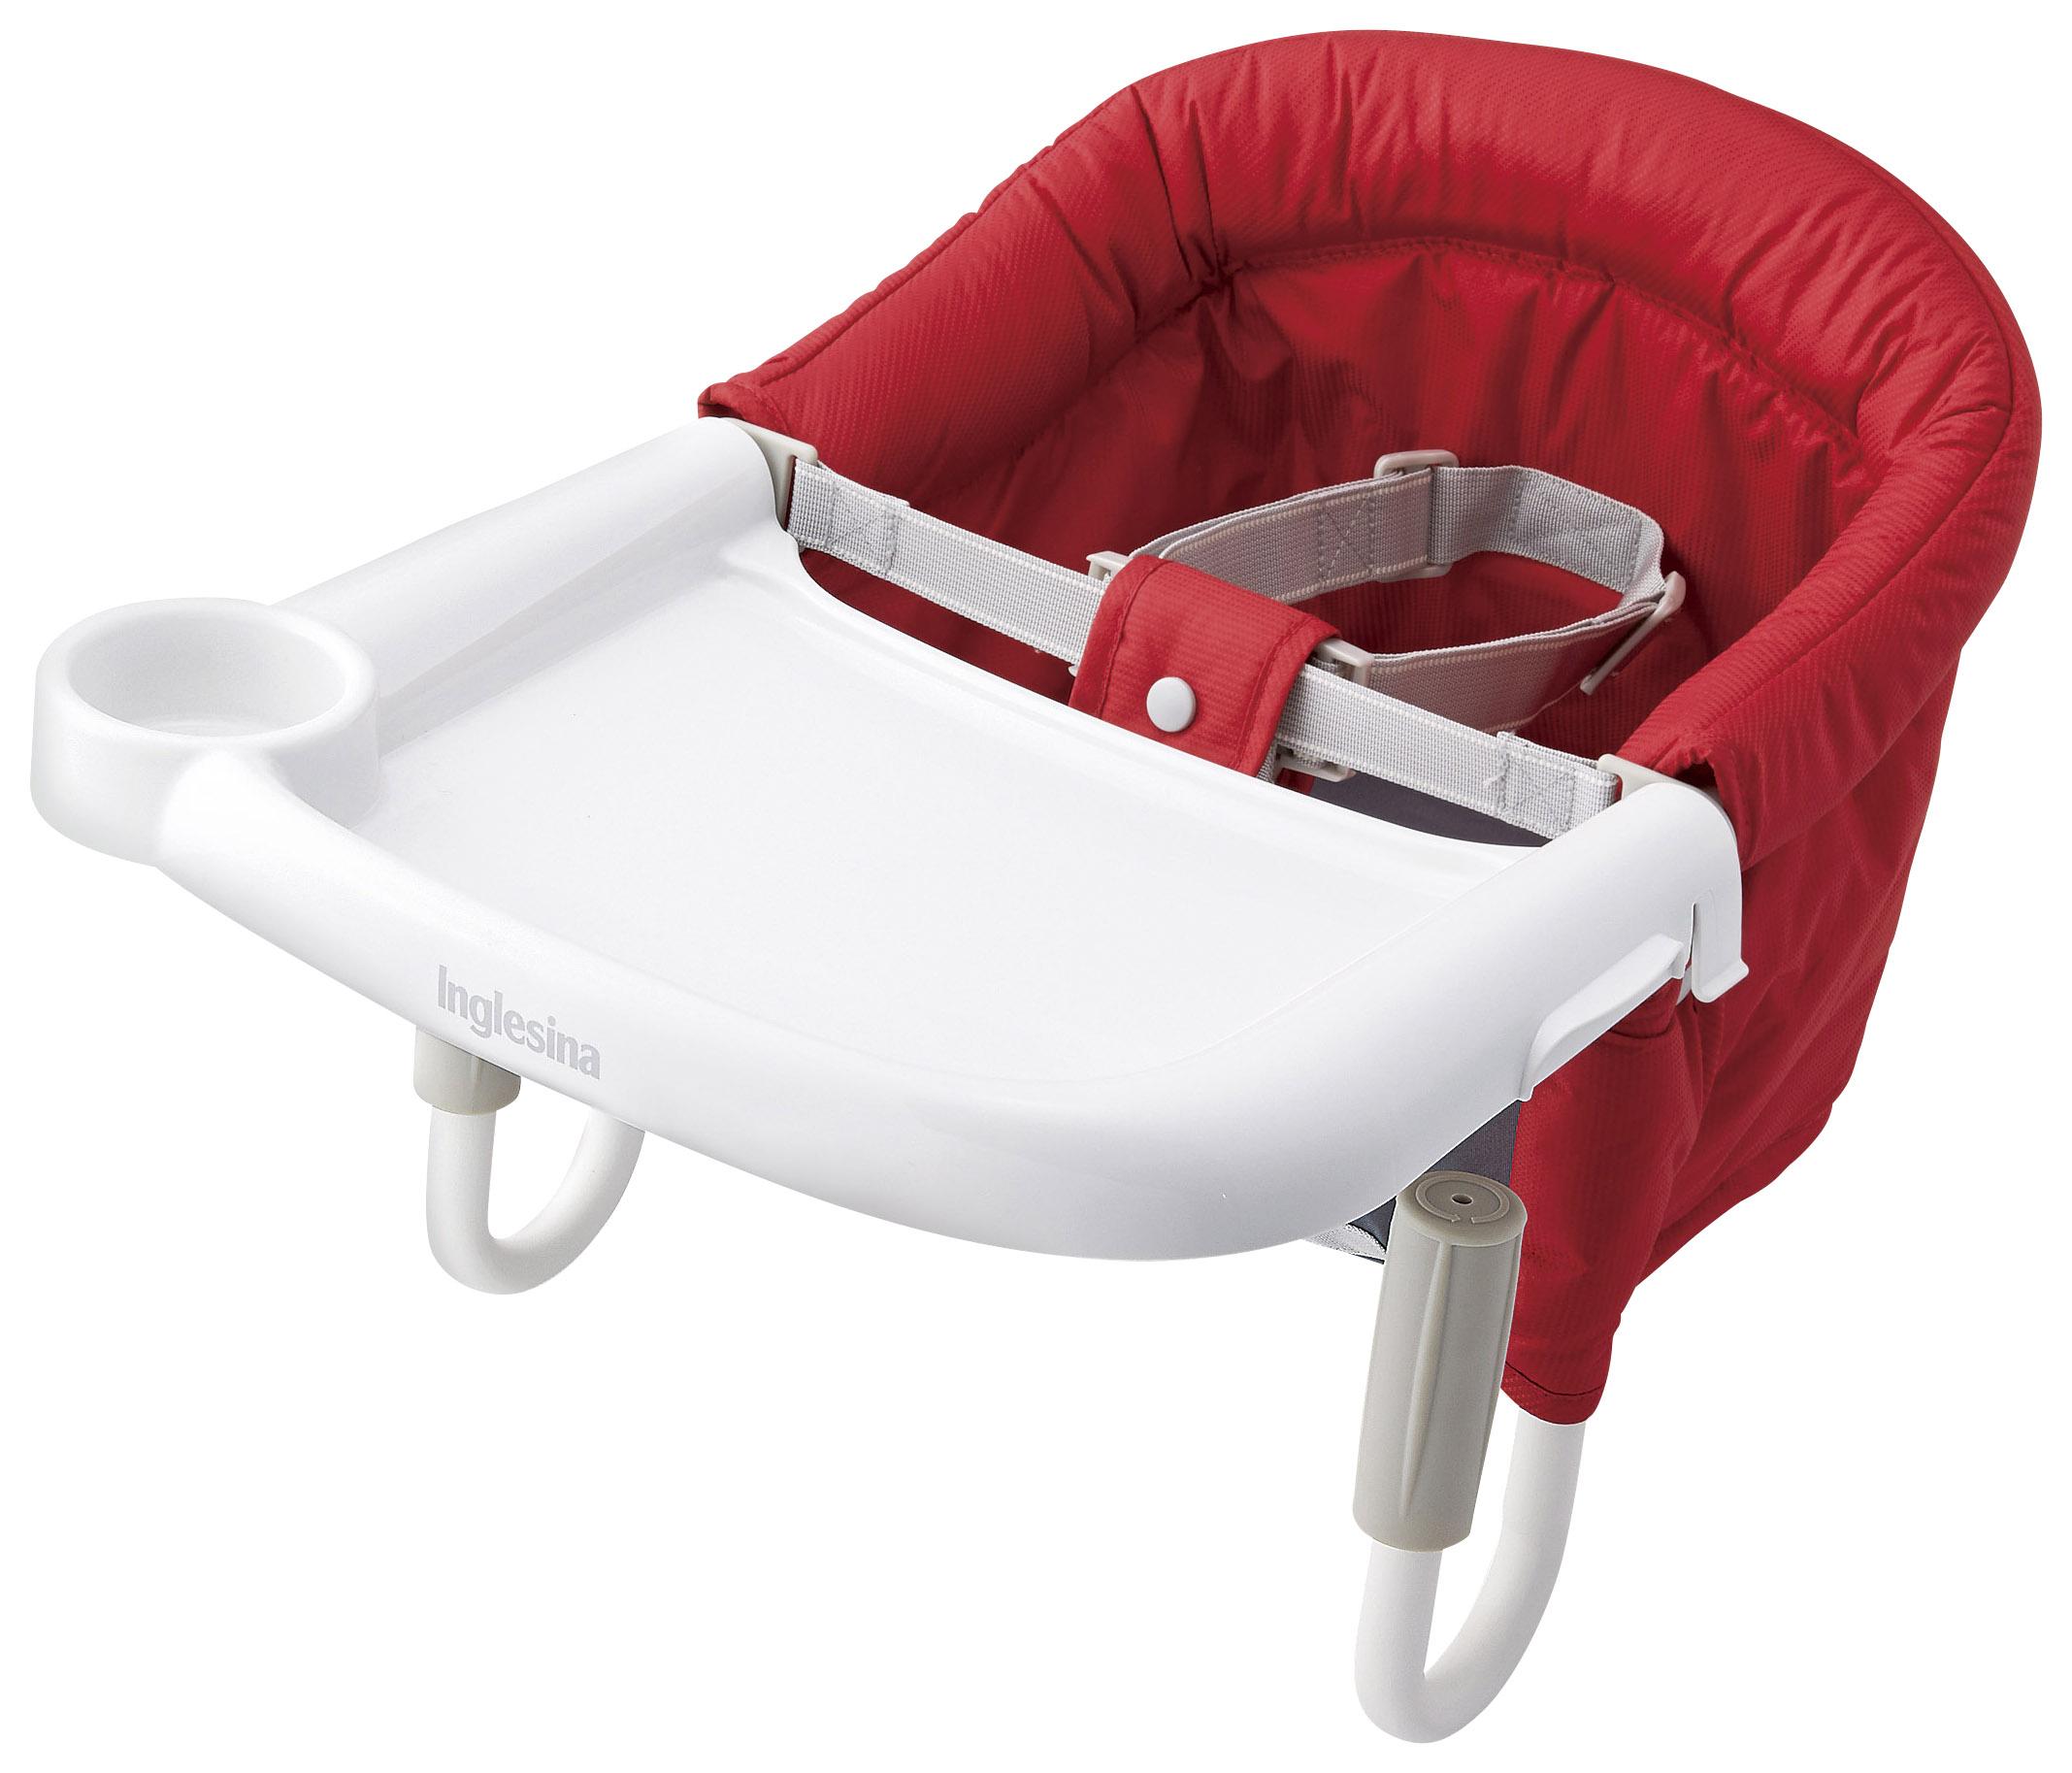 【L'inglesina Baby S.p.a.】イングリッシーナ ファスト 使用時/約35×42×高さ27cm レッド